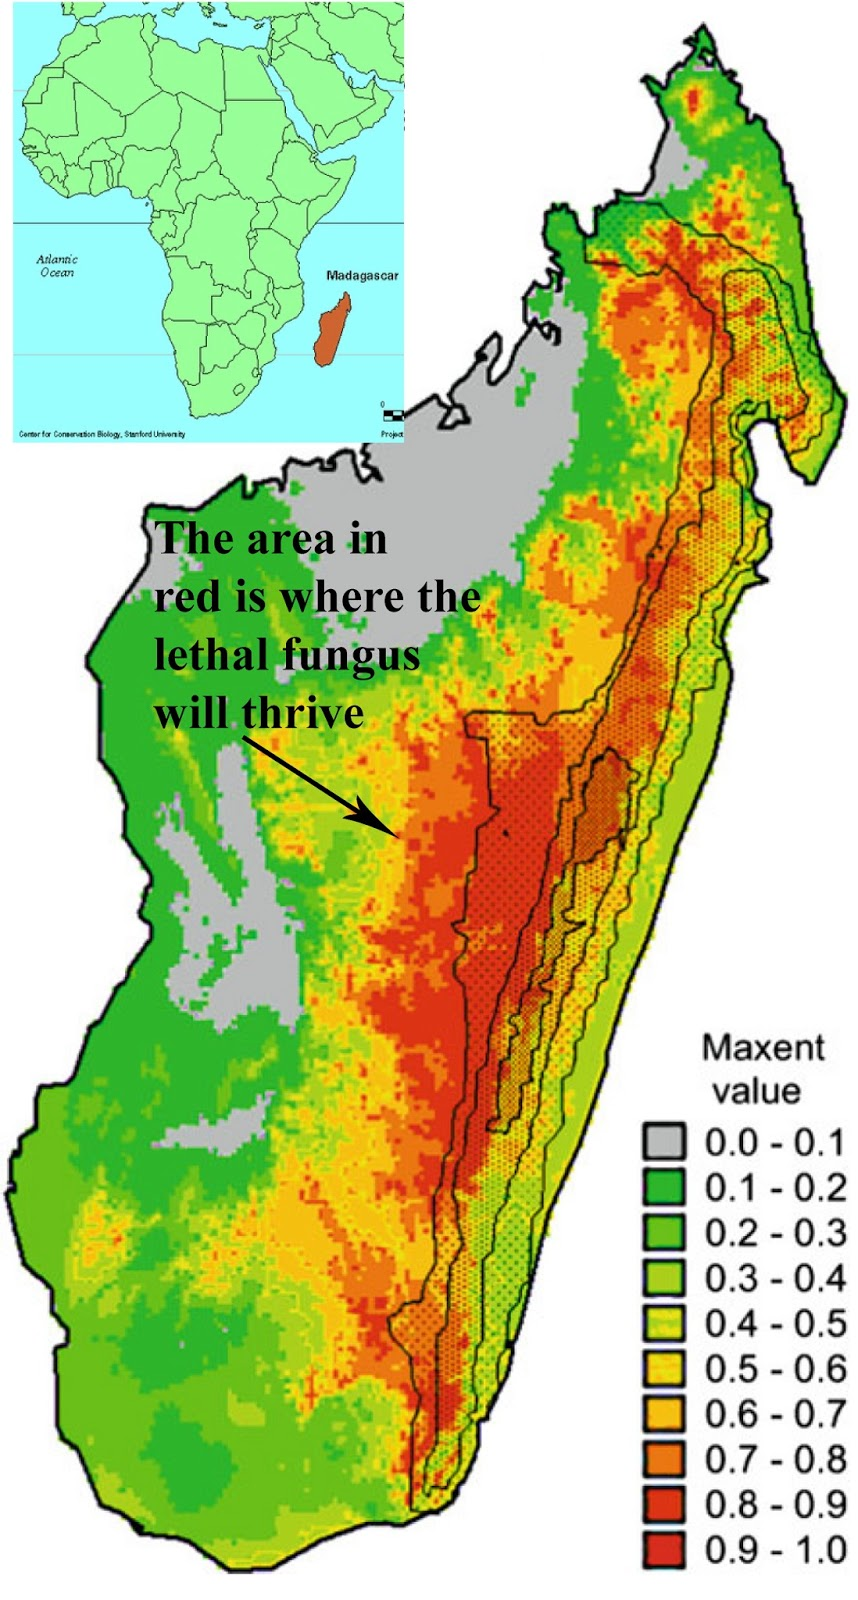 Frog Probiotics Madagascar - Where is madagascar